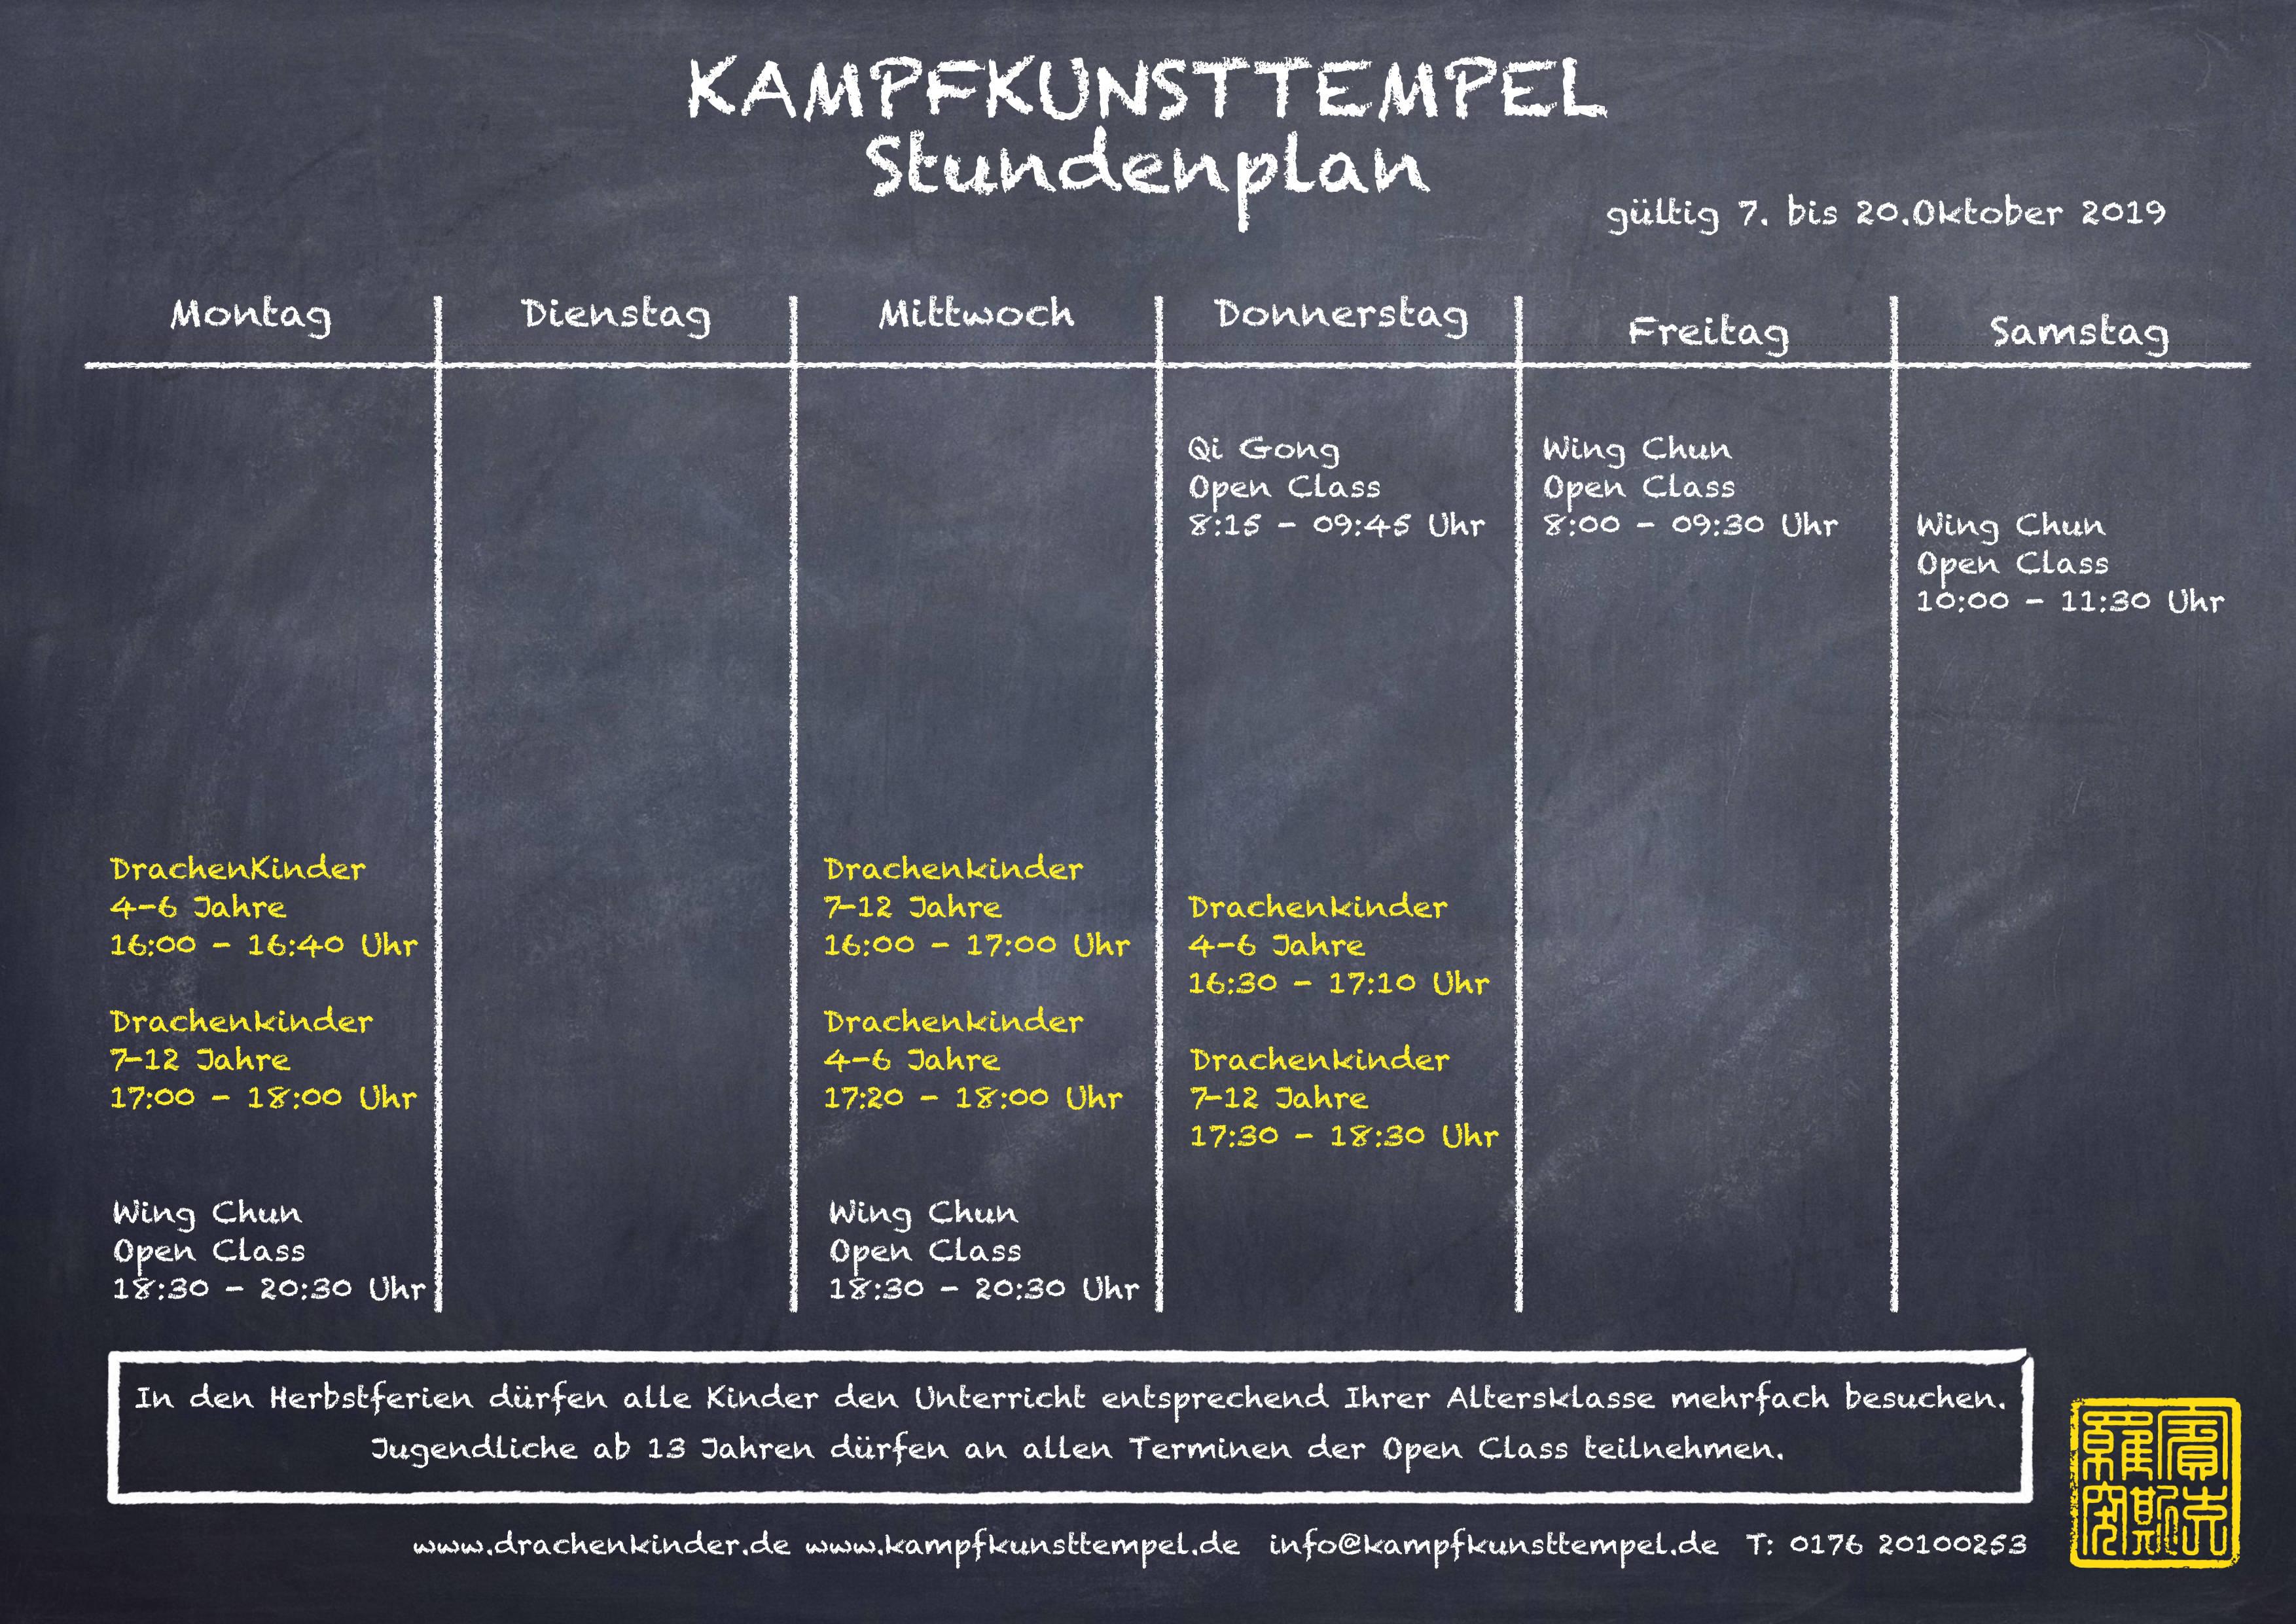 Kampfkunsttempel Jena Stundenplan Herbstferien